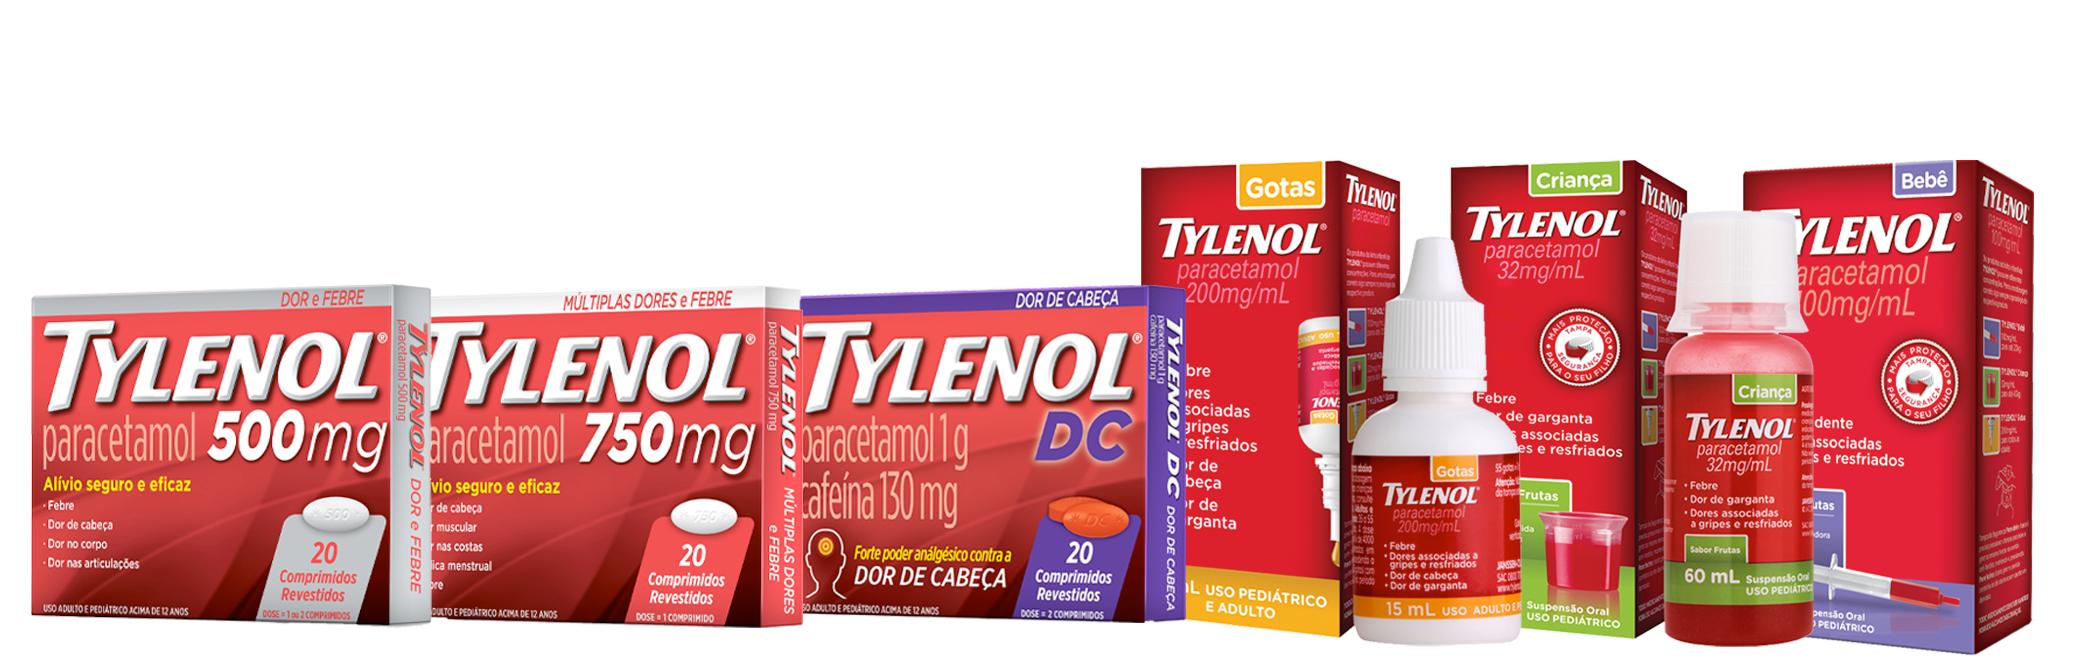 Produtos | TYLENOL®